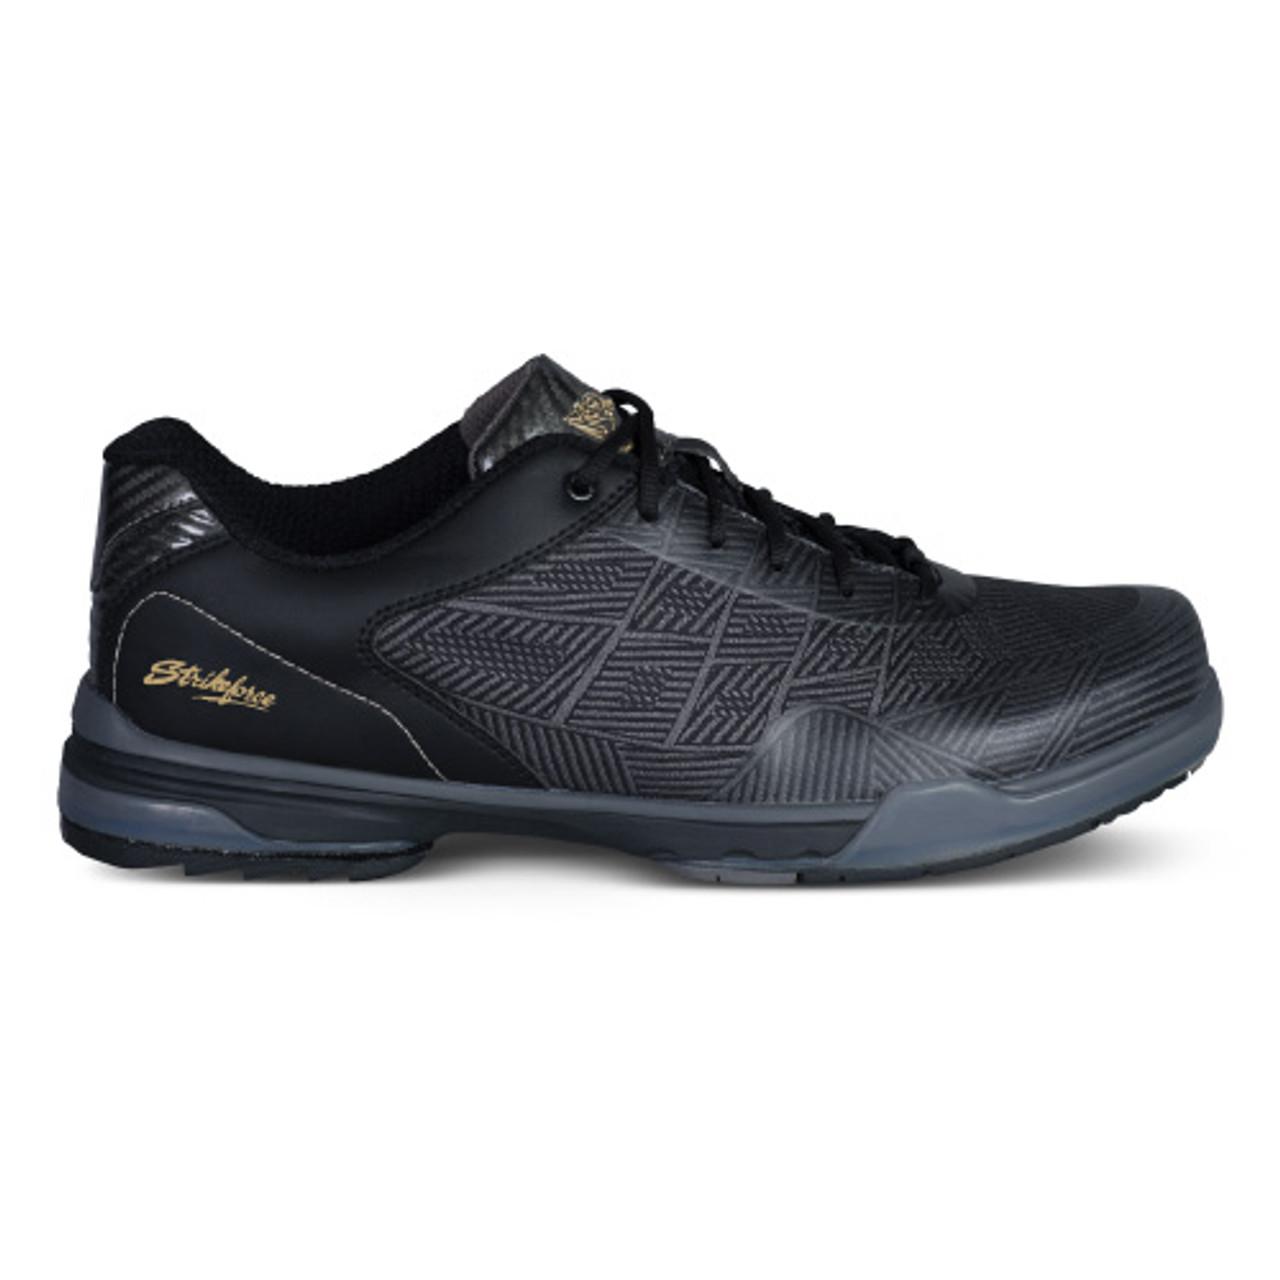 KR Strikeforce Mens Rage Bowling Shoes Gunmetal/Black Right Handed